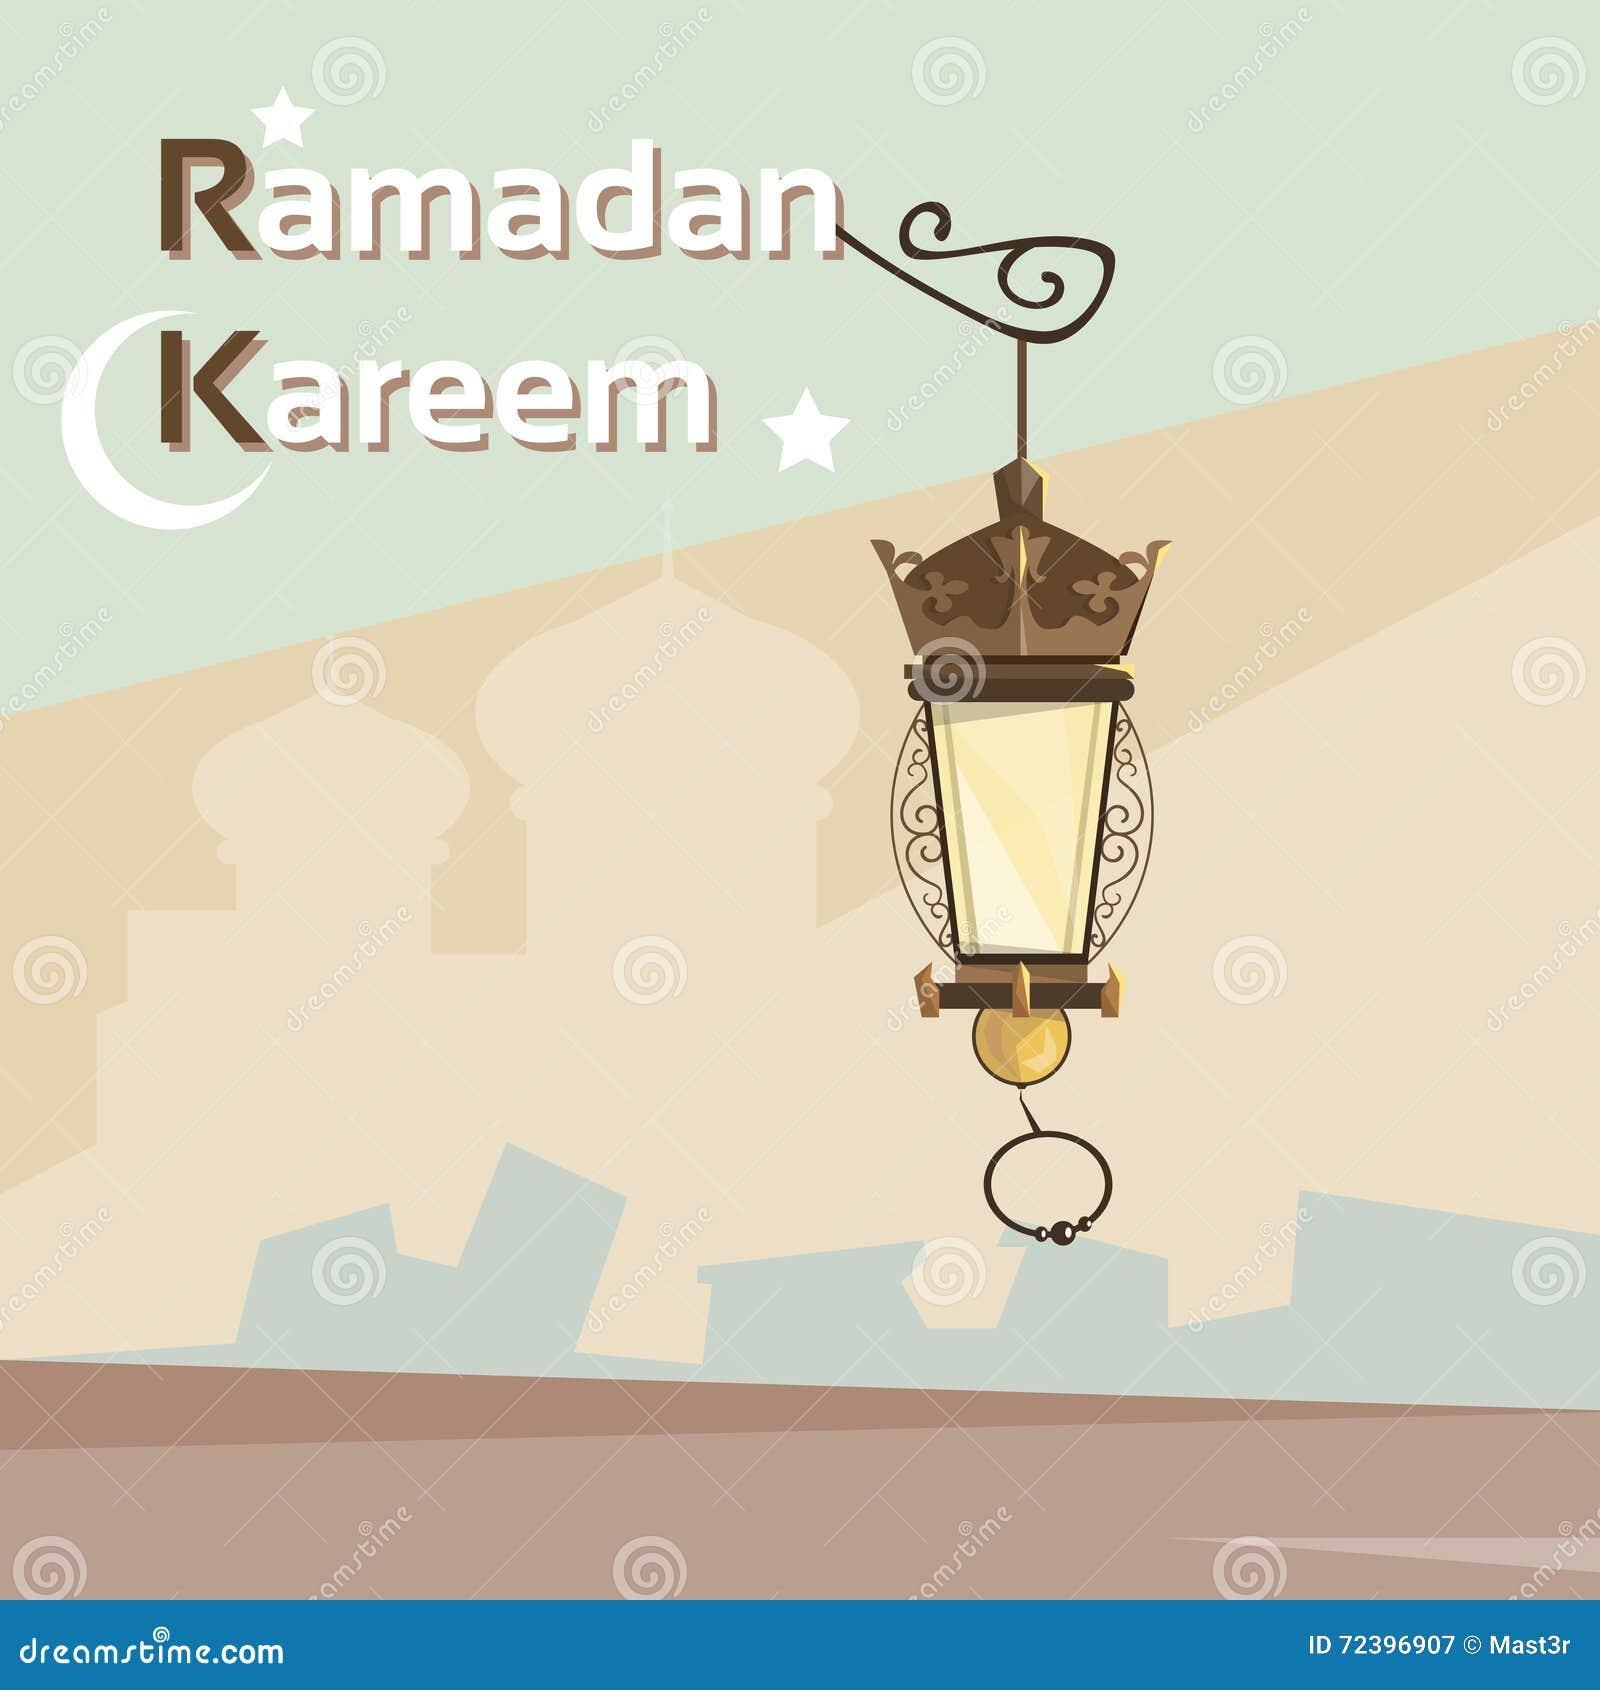 Ramadan Kareem Lantern Mosque Background Muslim Religion Holy Month